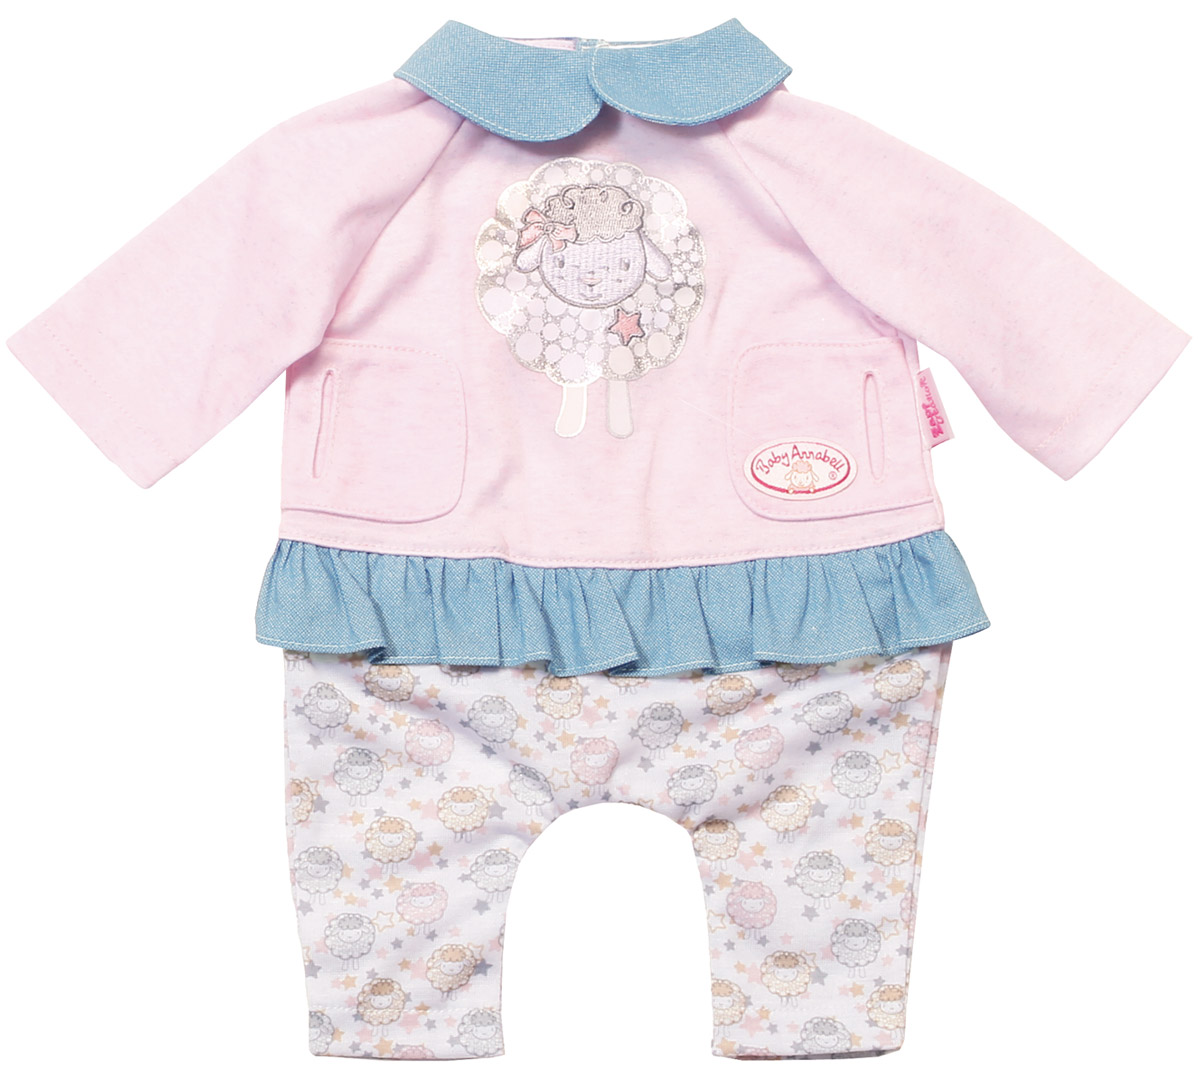 Baby Annabell Одежда для куклы Спокойной ночи baby annabell подгузники для куклы baby annabell